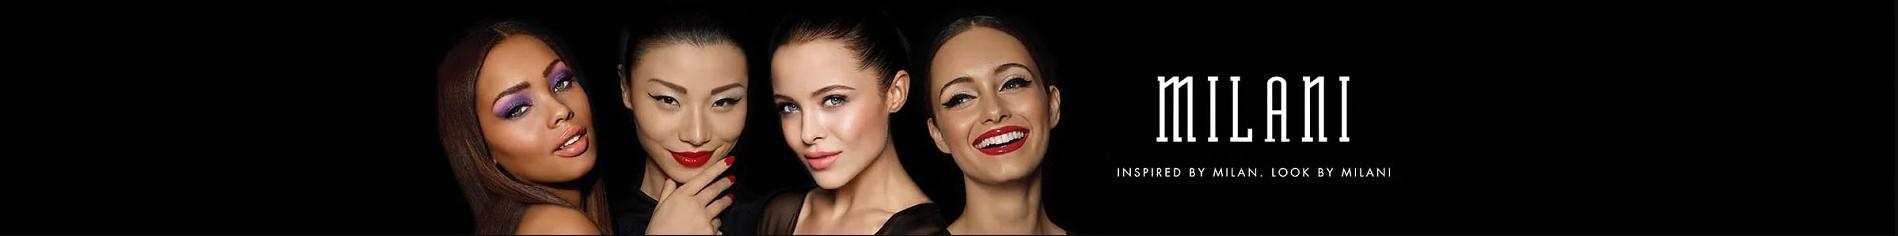 marca-milani-cosmetics